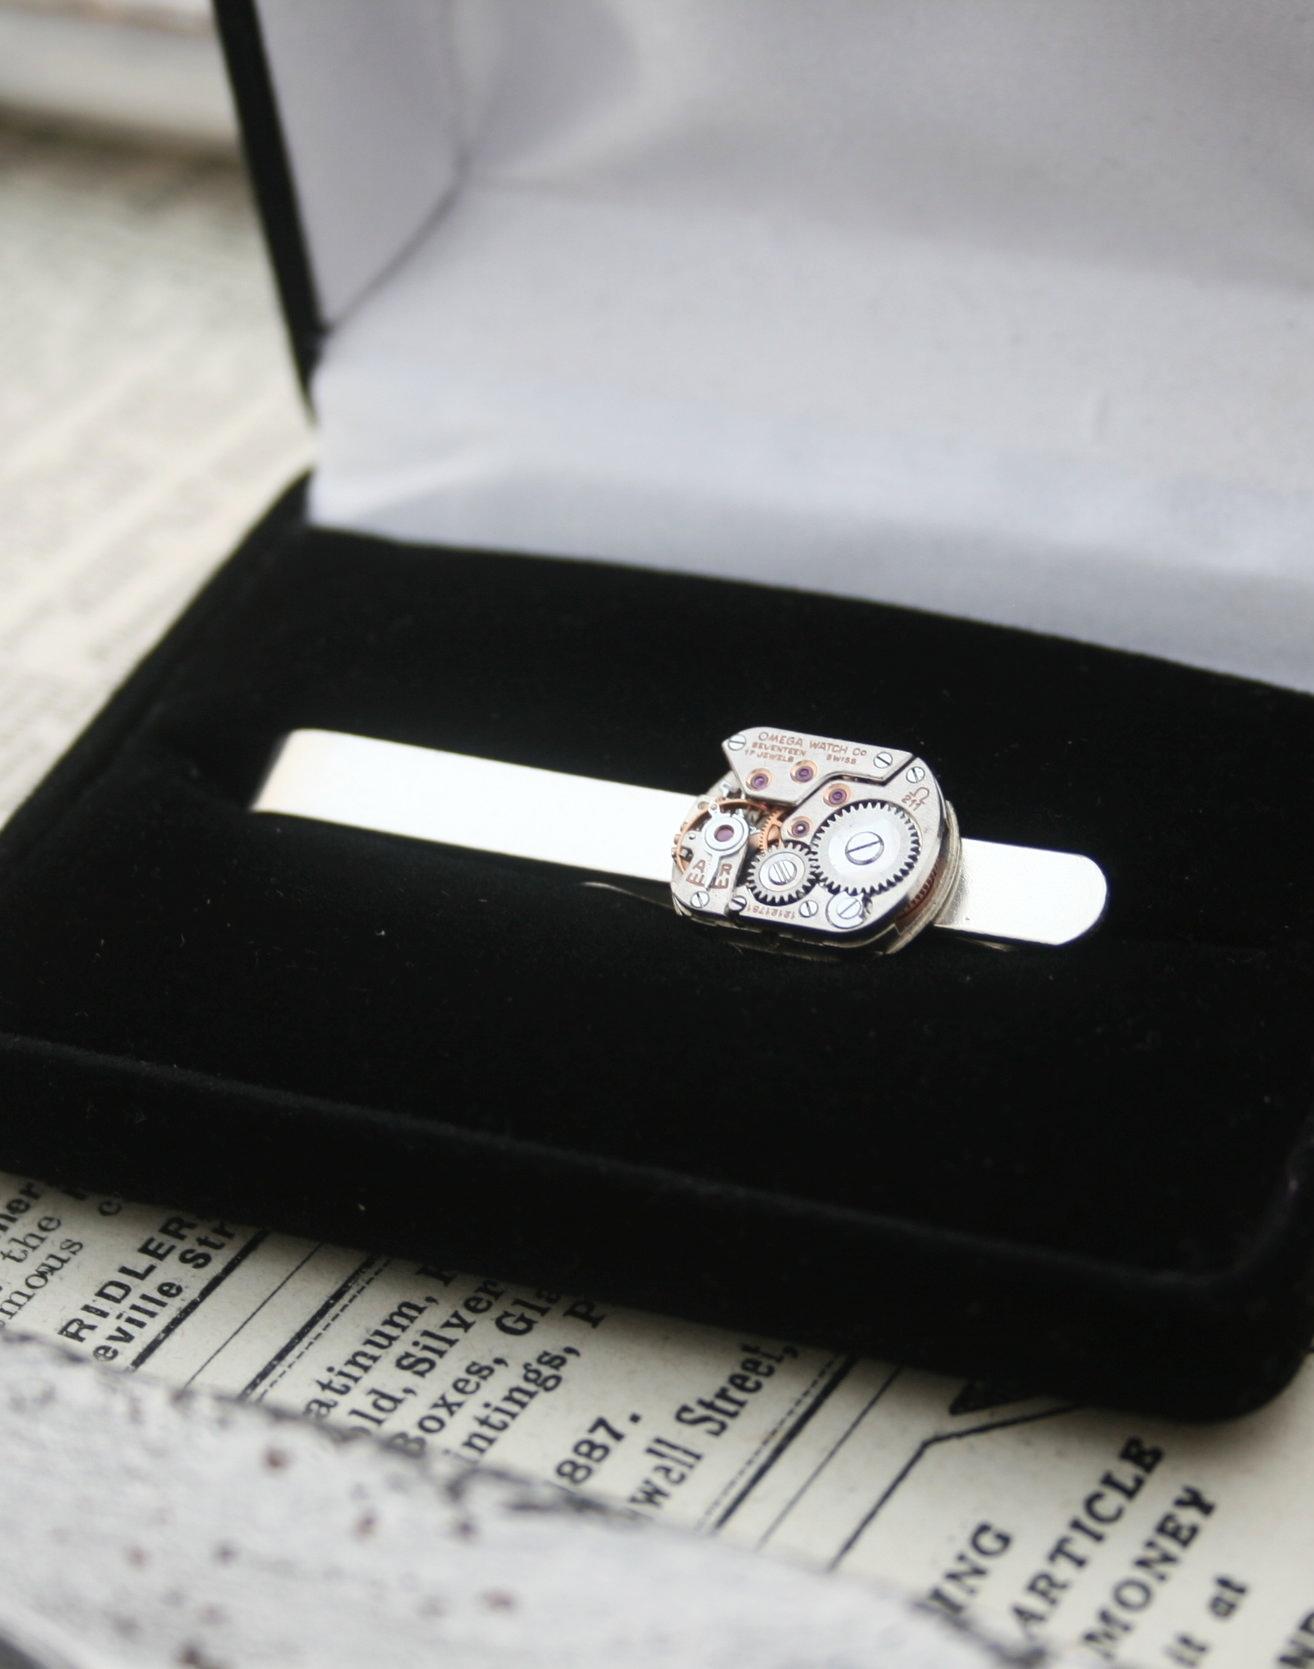 Omega Watch Tie Clip